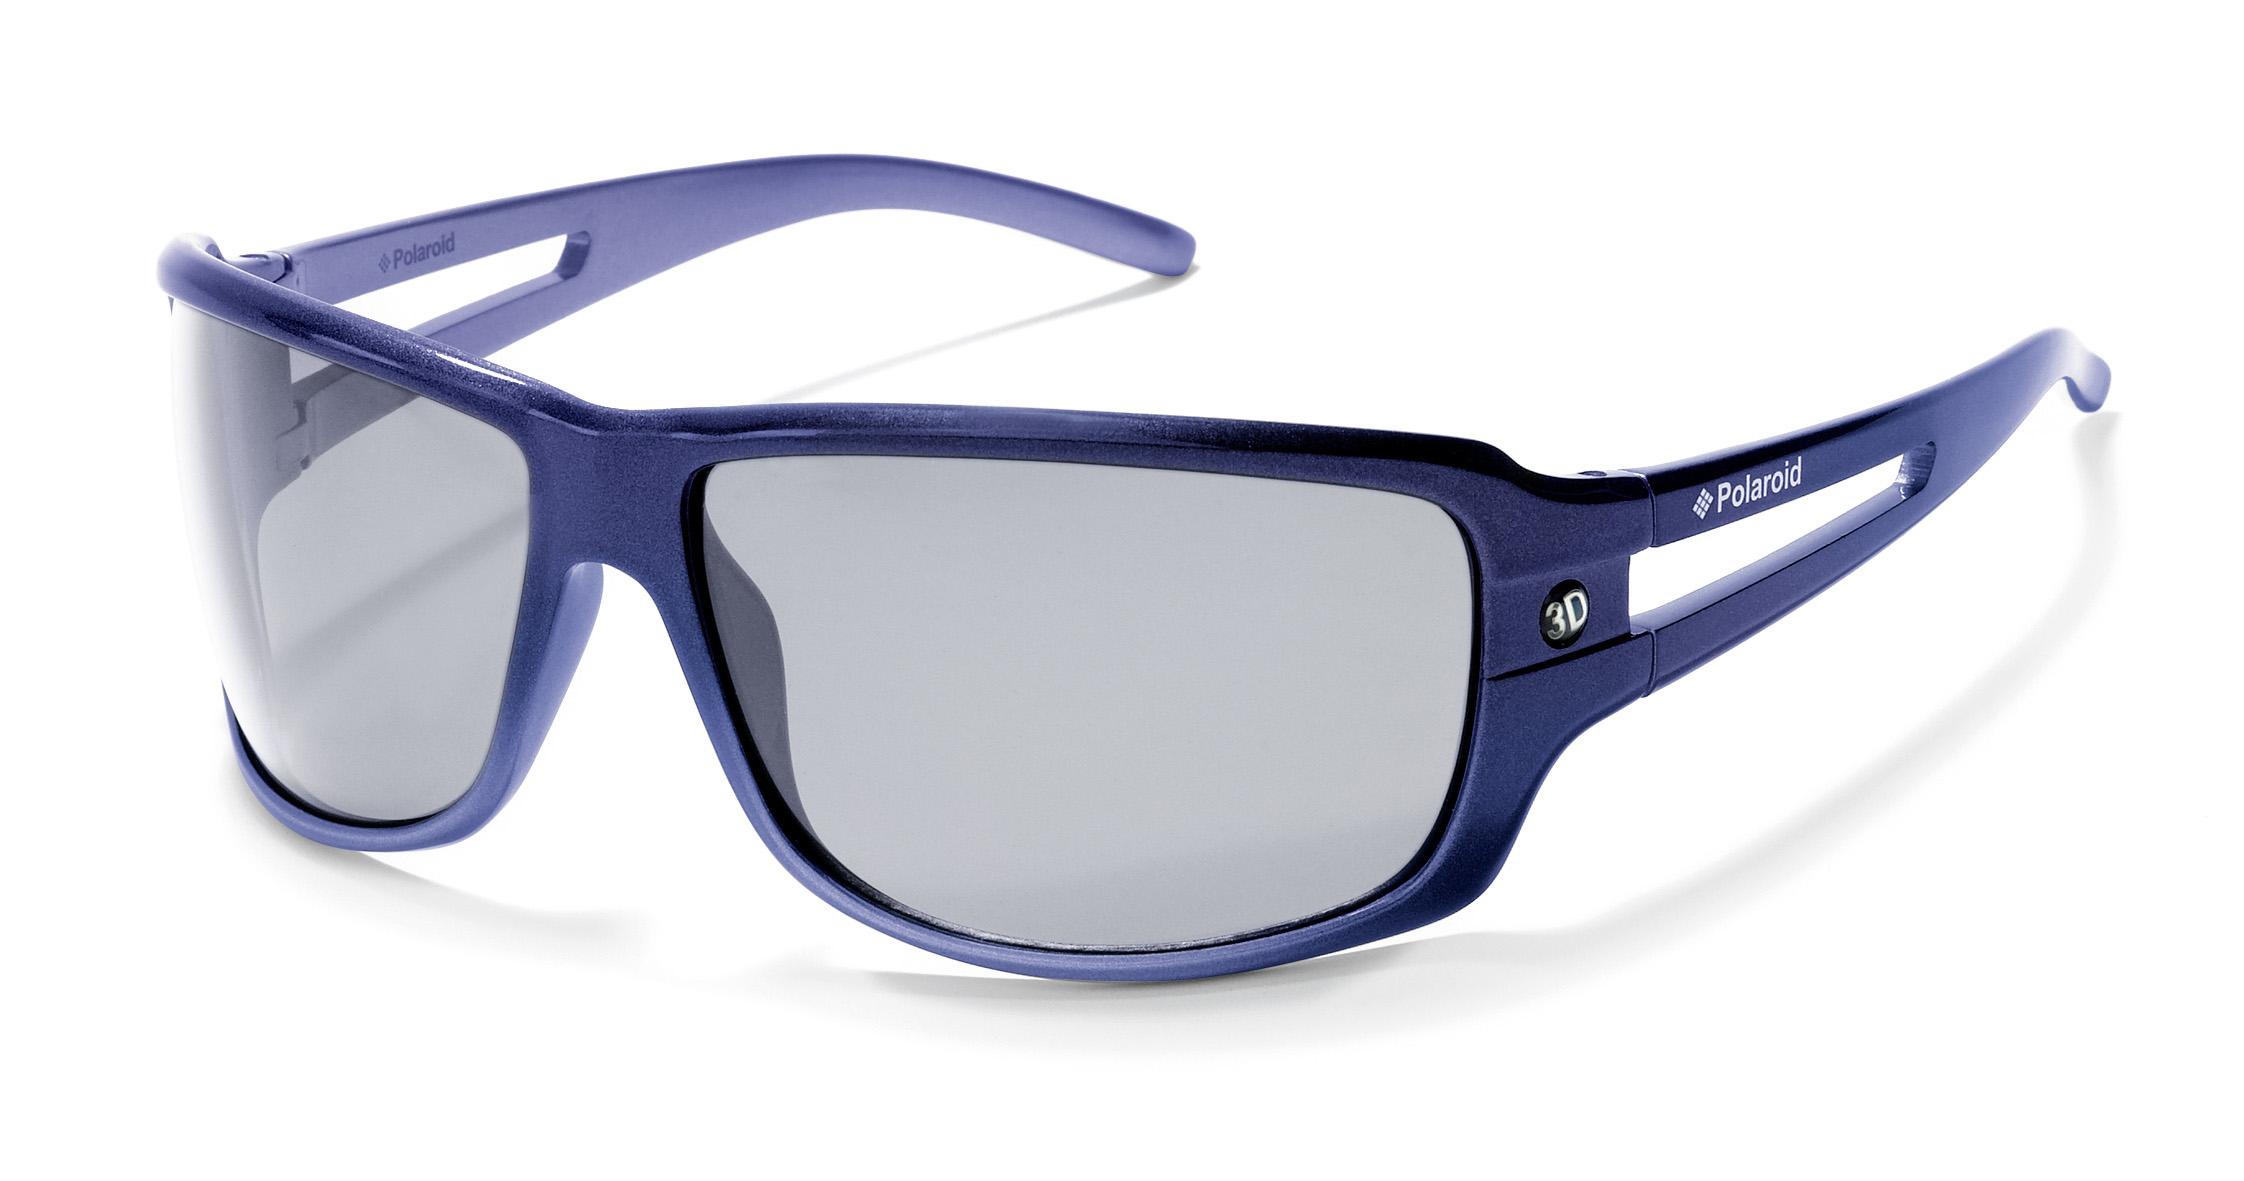 Polaroid VIP N8103B RealD 3D Glasses Review - HeyUGuys